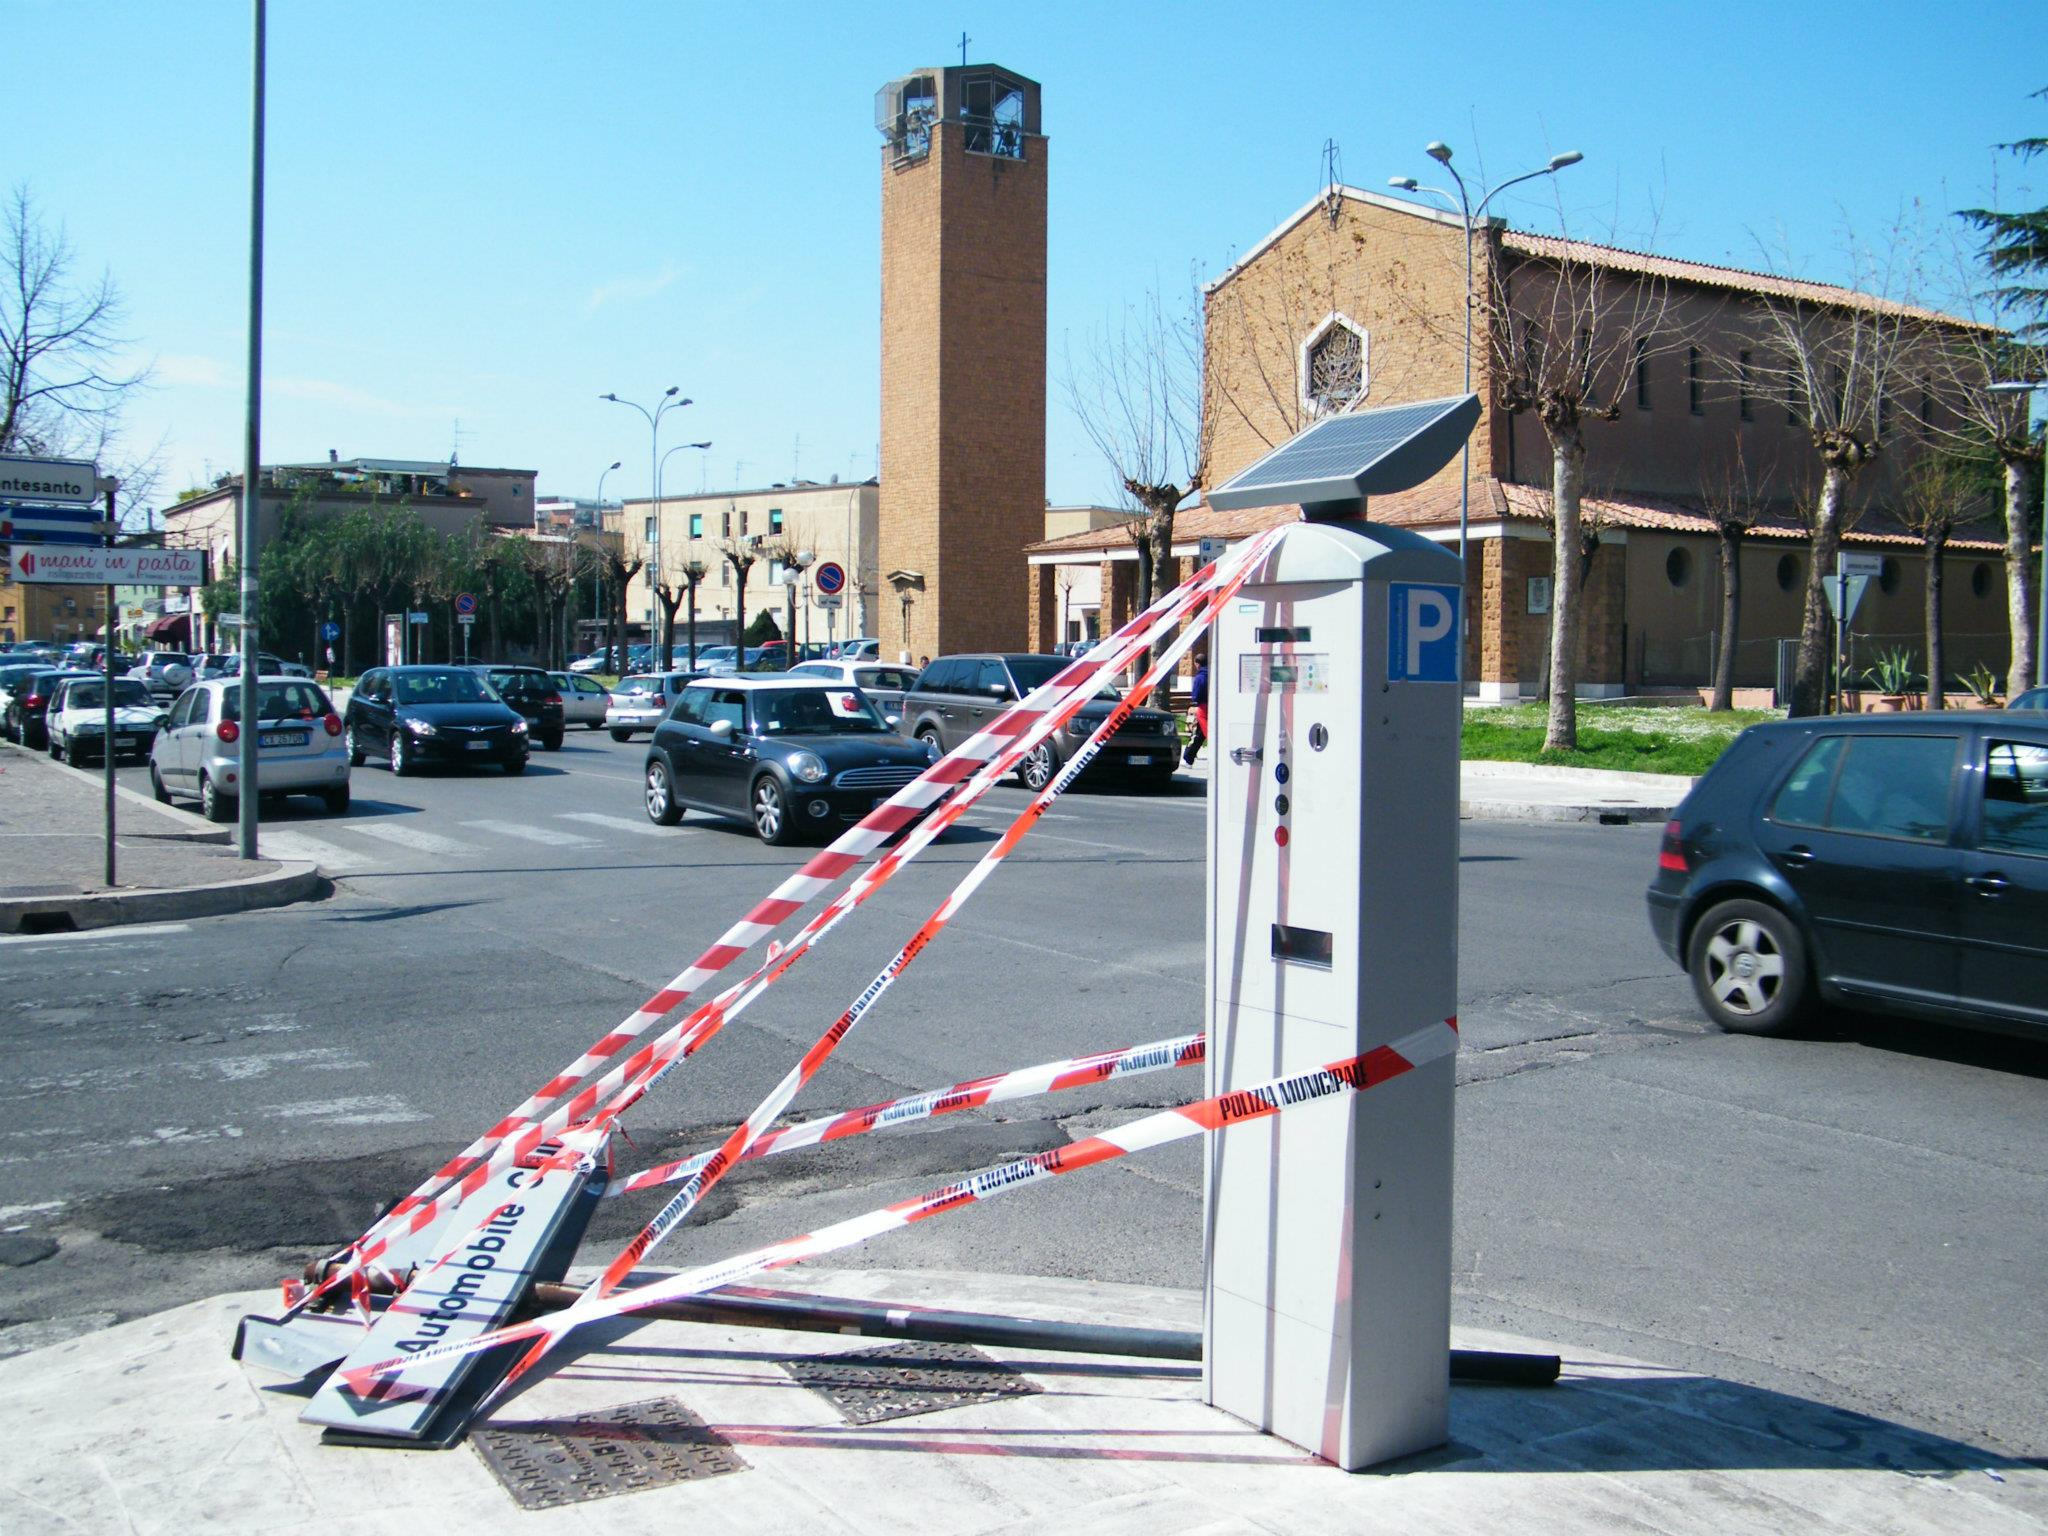 palo-caduto-santa-maria-goretti-latina-5768973